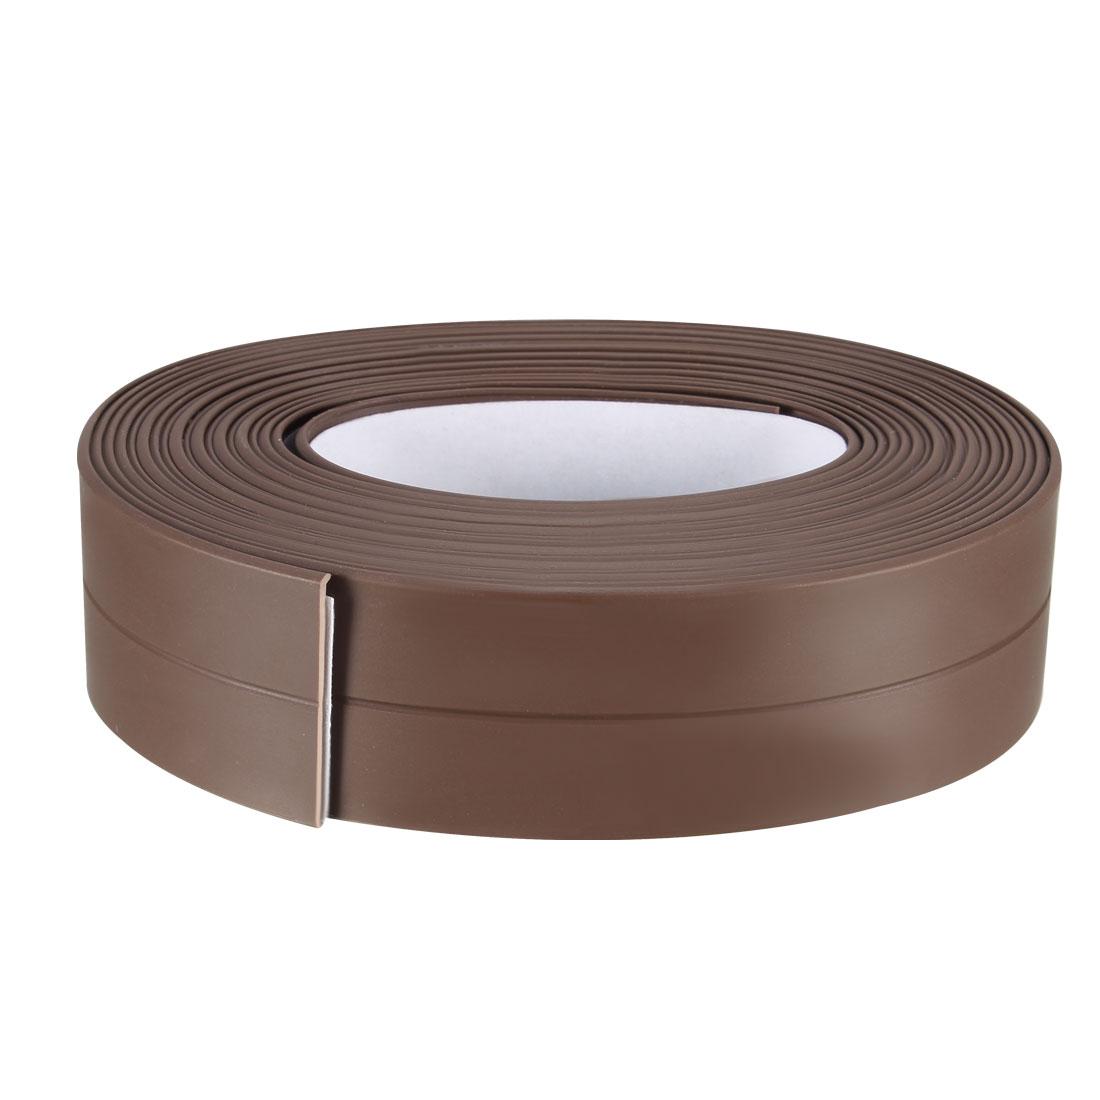 Caulk Strip Flexible Self Adhesive Tape for Wall Sealing 10.5ftx22mm Coffee 3pcs